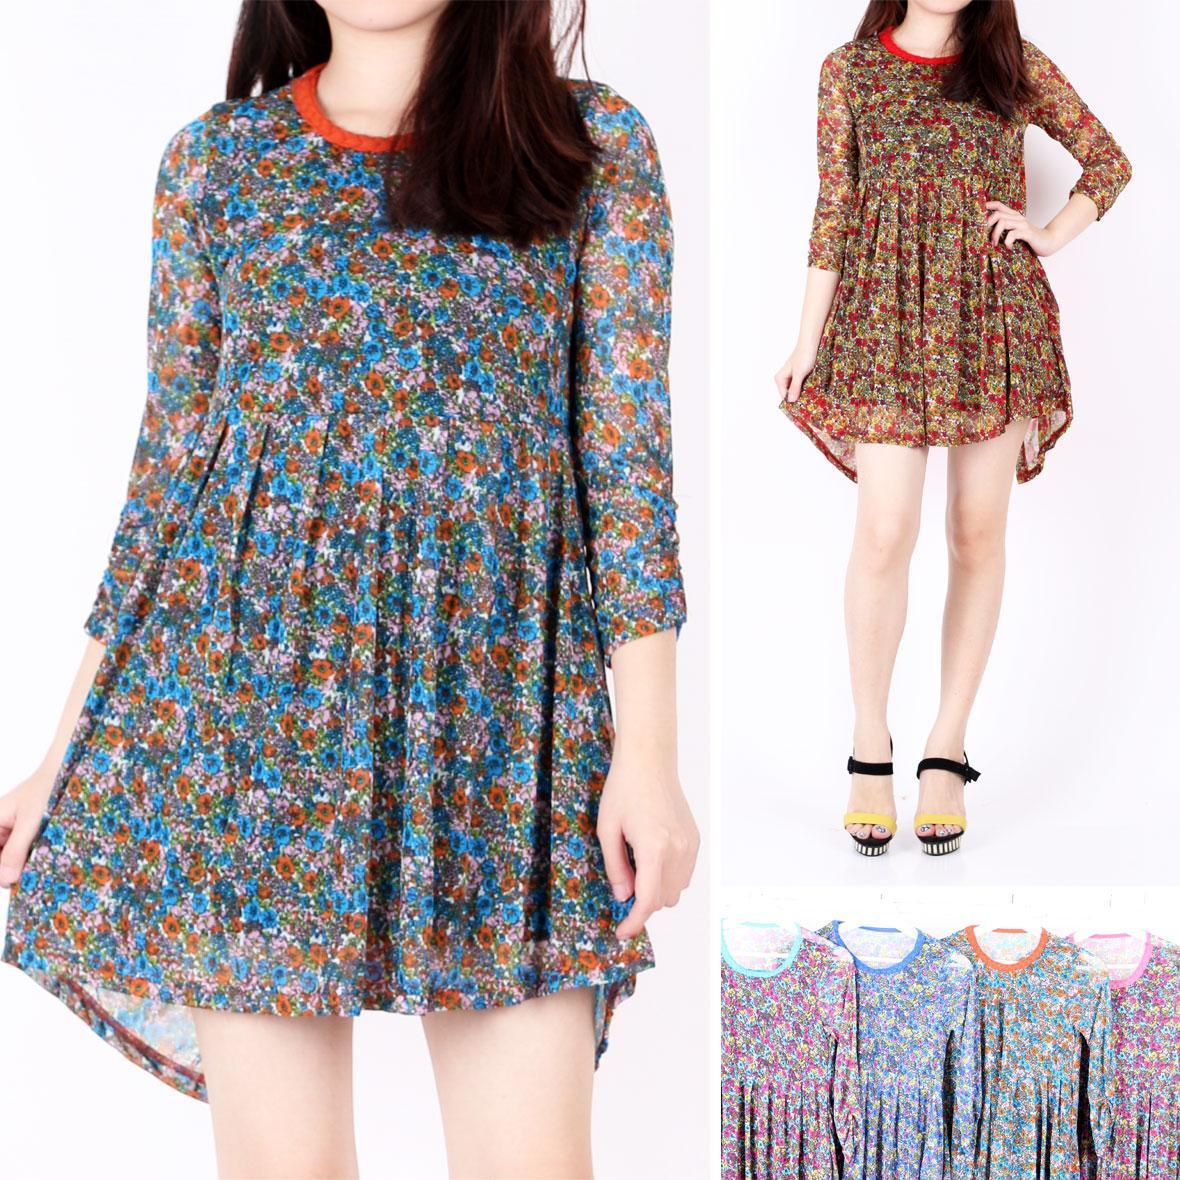 Oma Holley Fashion Filona Mini Dress 3/4 Lengan 4 Warna - Size M